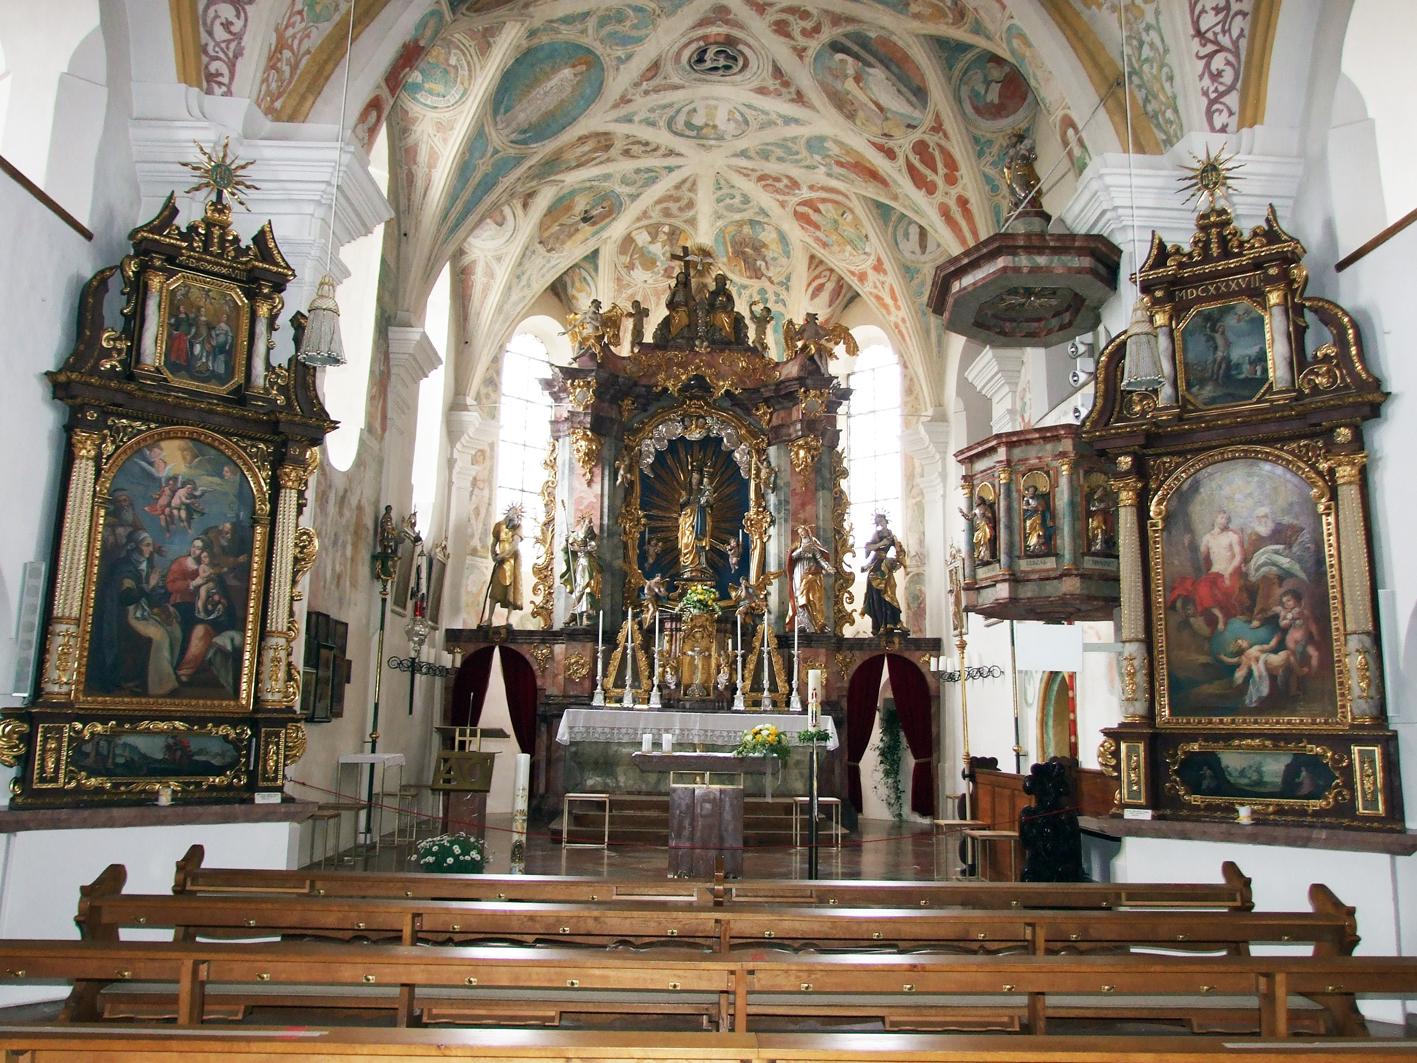 2021 05 17 aoelfb niedergottsau kirche mariae himmelfahrt blick in kirche2